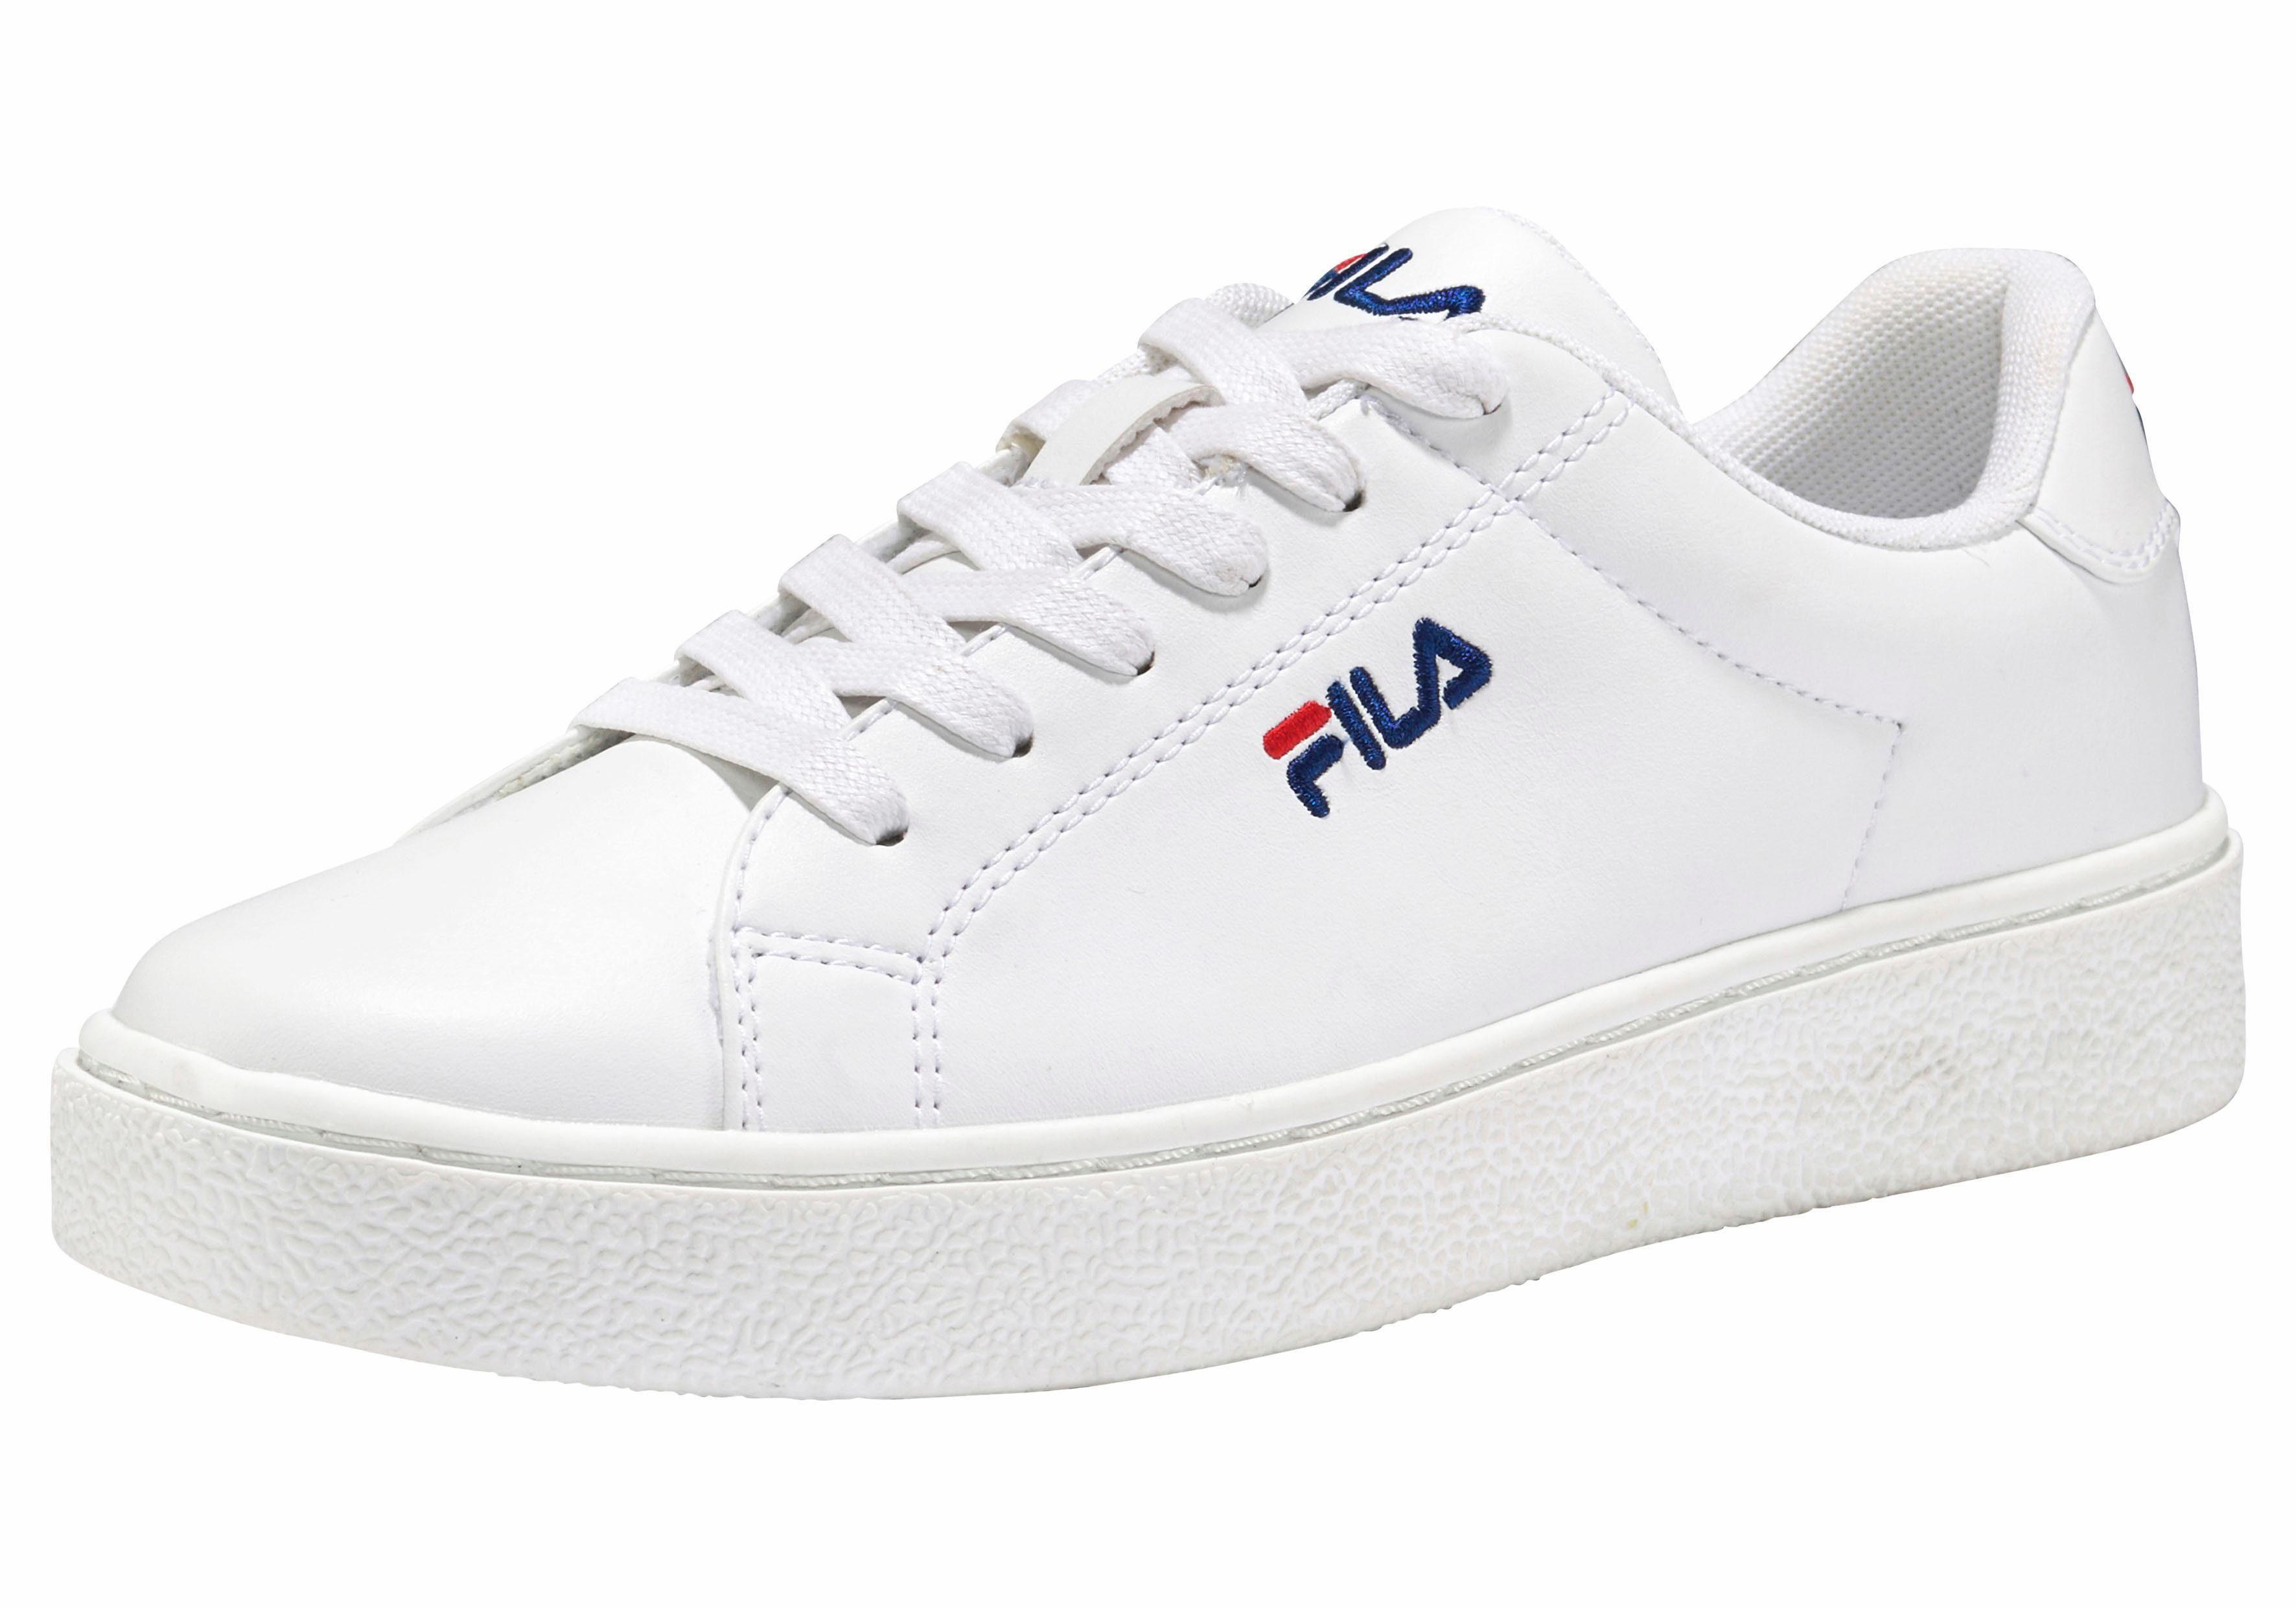 Fila »Upstage Low Wmn« Sneaker online kaufen | OTTO